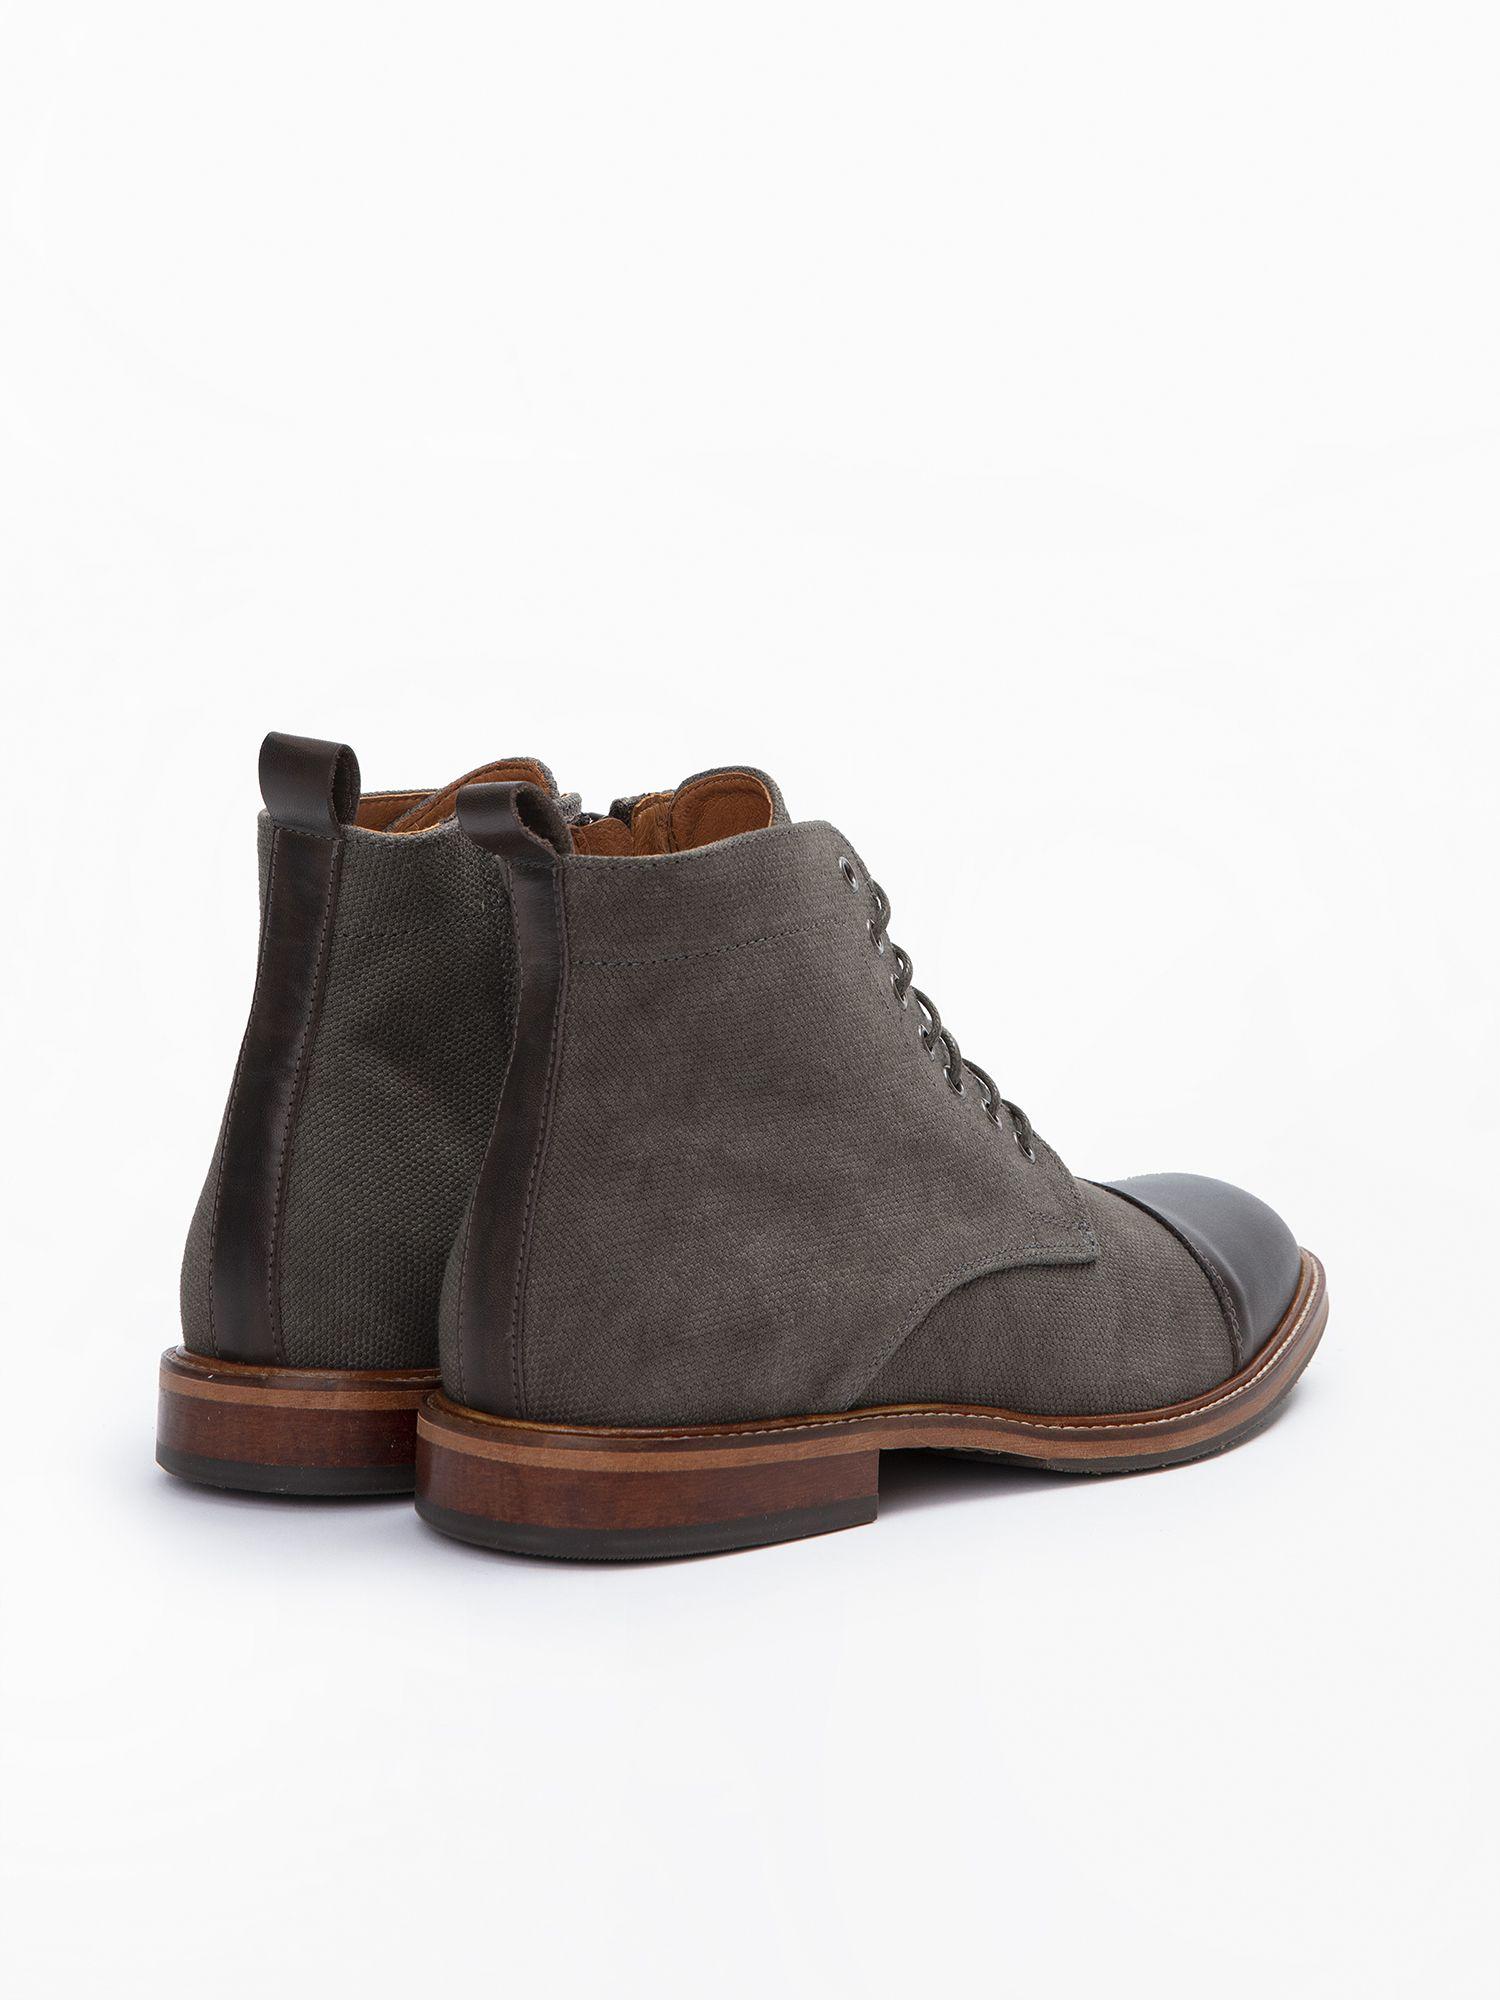 schmoove.fr Knock Boots - Alfa/Bufalo - Coffee/Taupe